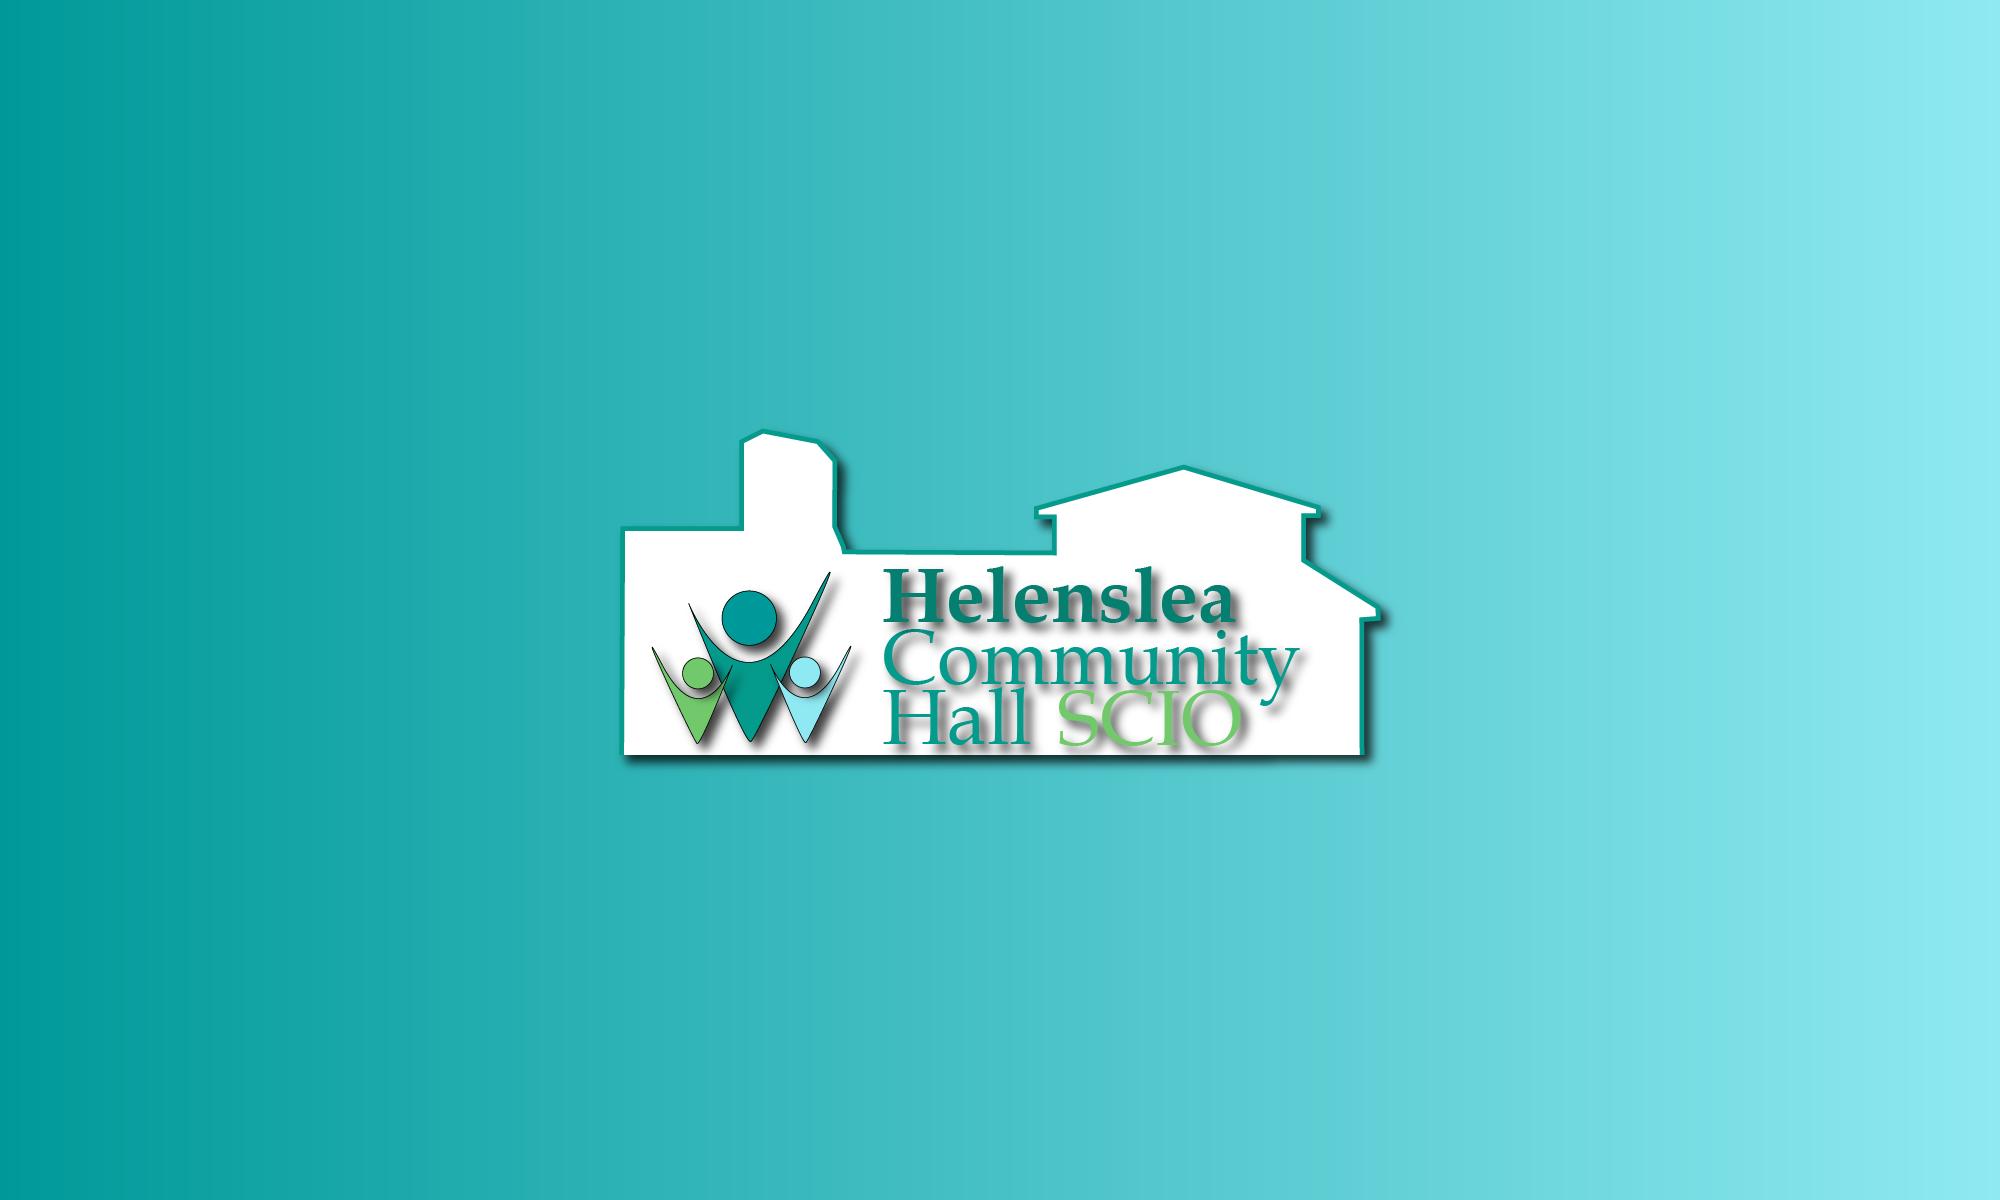 Helenslea Community Hall